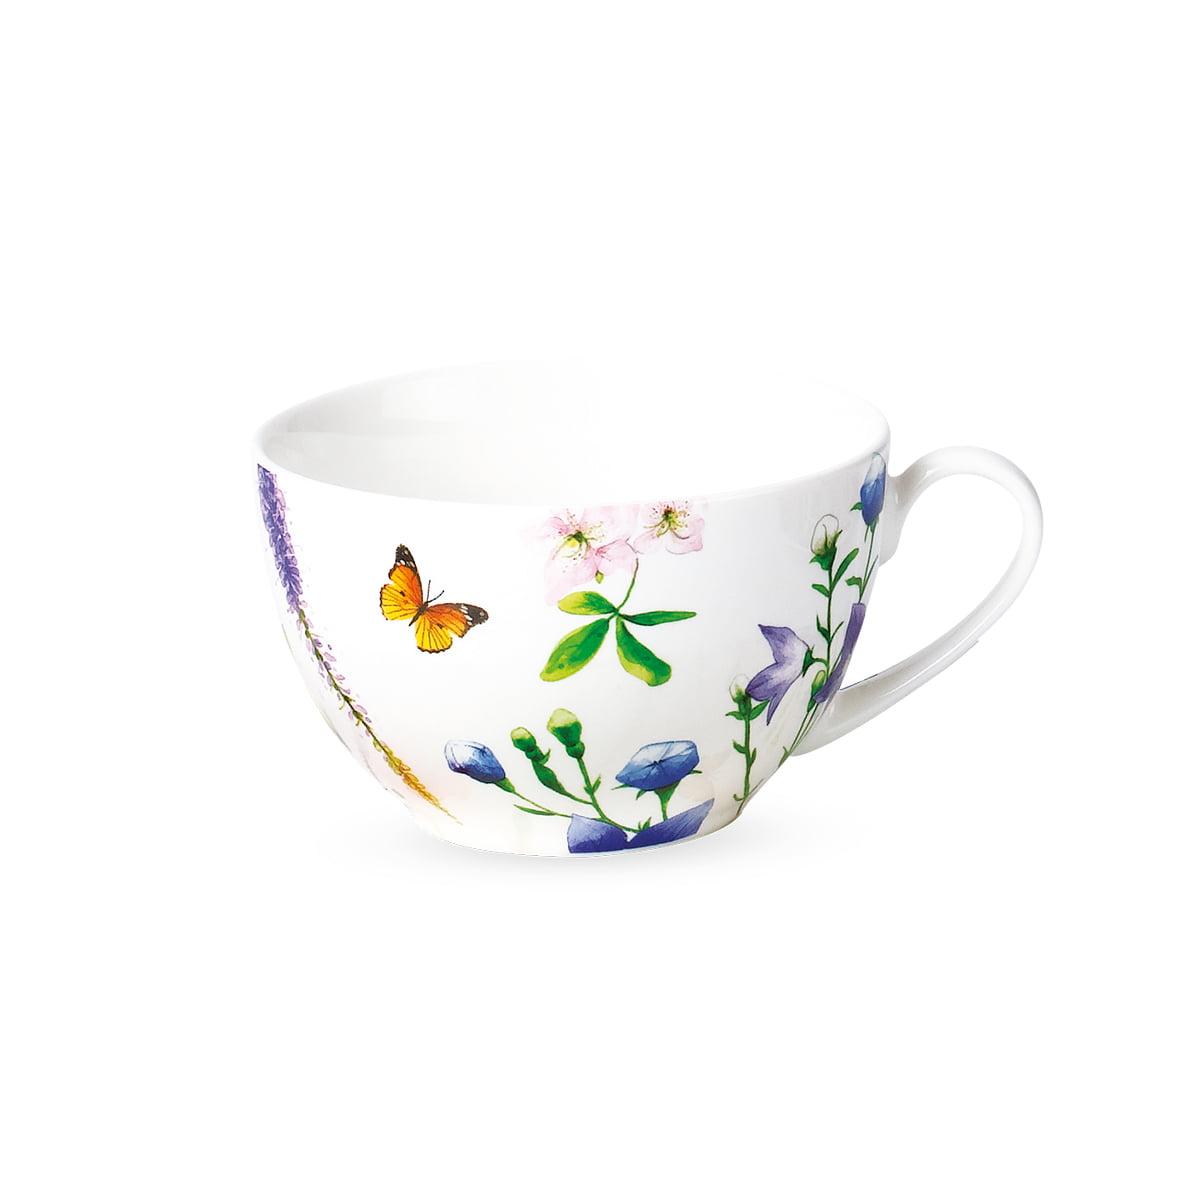 Butterfly porcelanski set za ručavanje 5 - Šolja